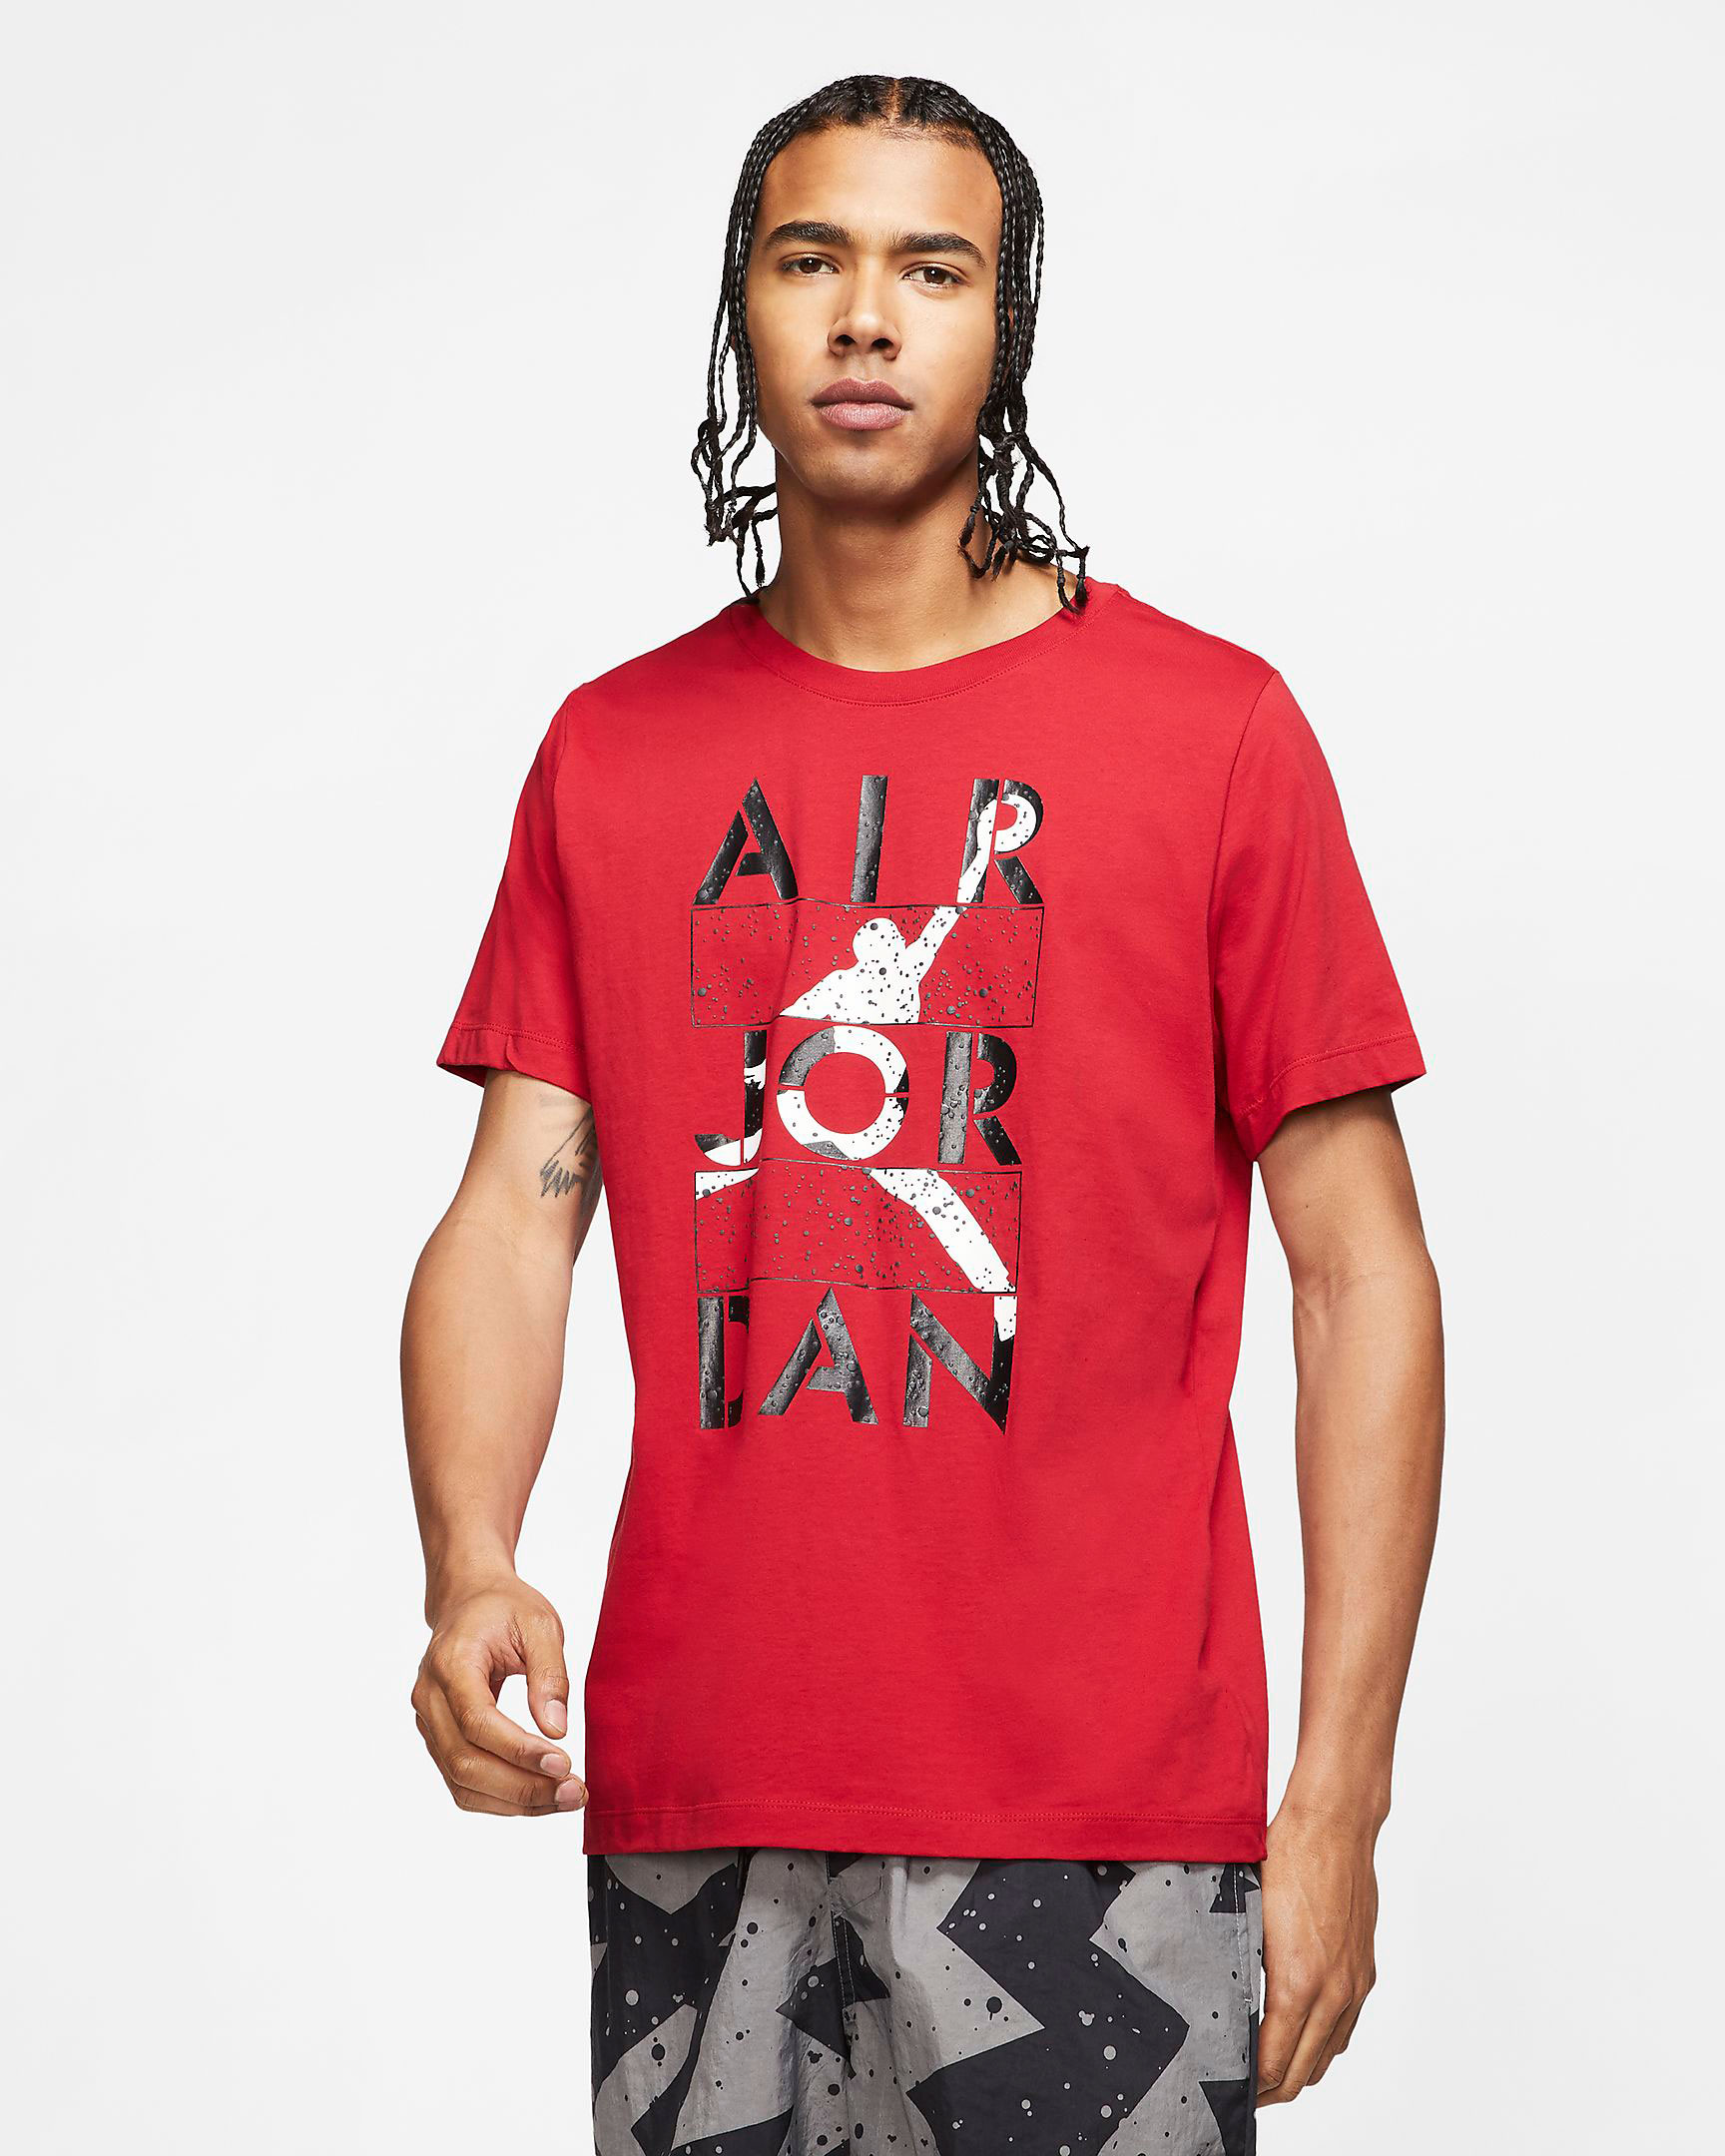 air-jordan-4-red-metallic-shirt-match-3